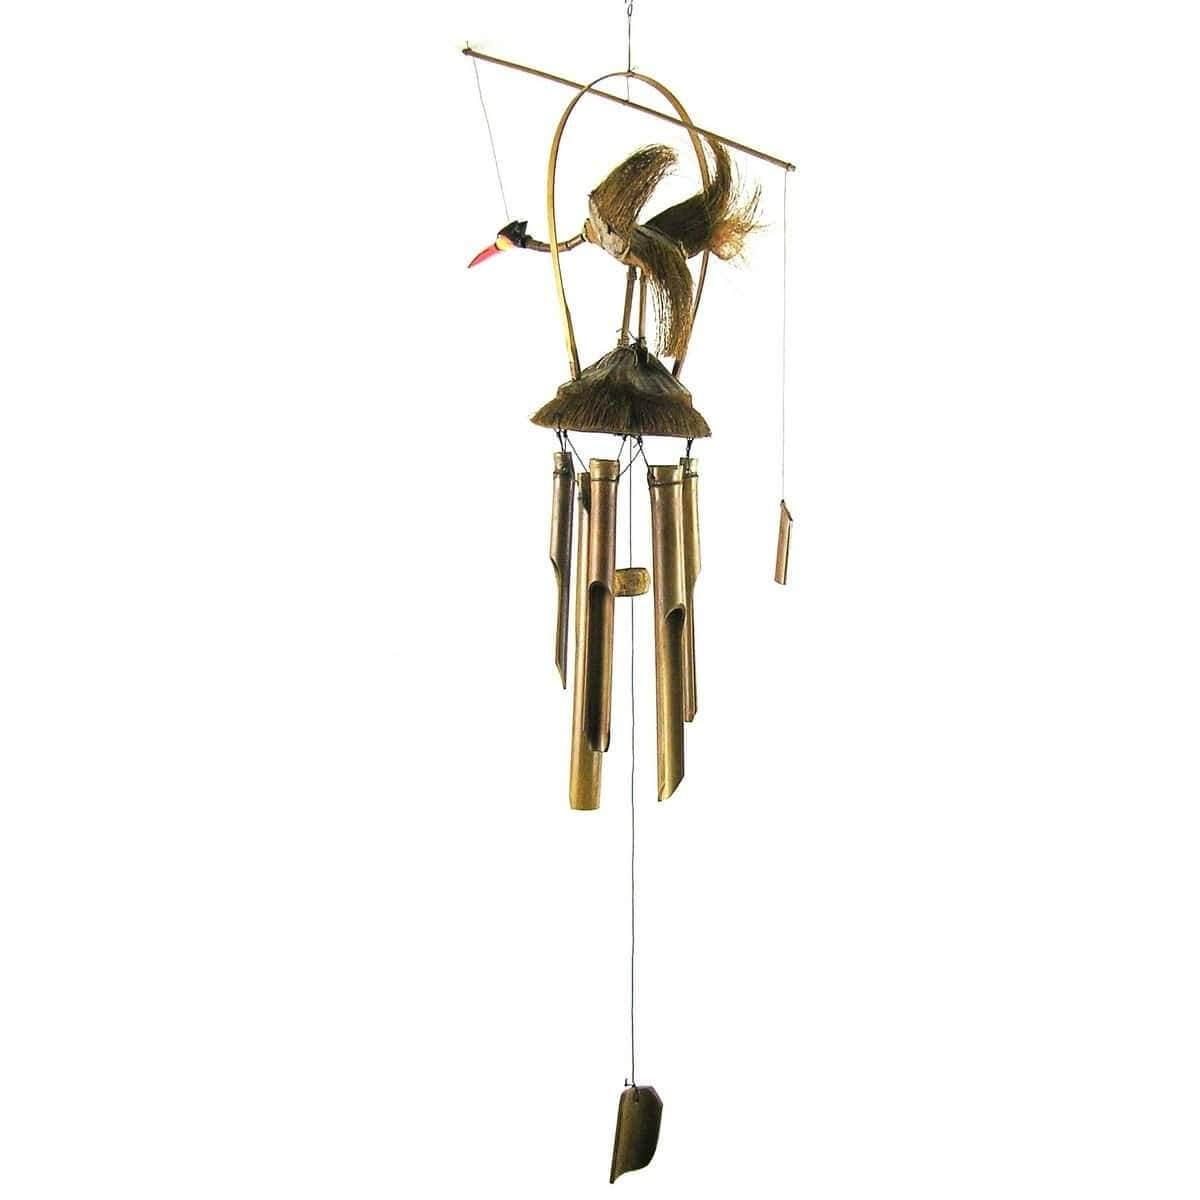 windspiel klangspiel bambus klang deko terrasse garten. Black Bedroom Furniture Sets. Home Design Ideas